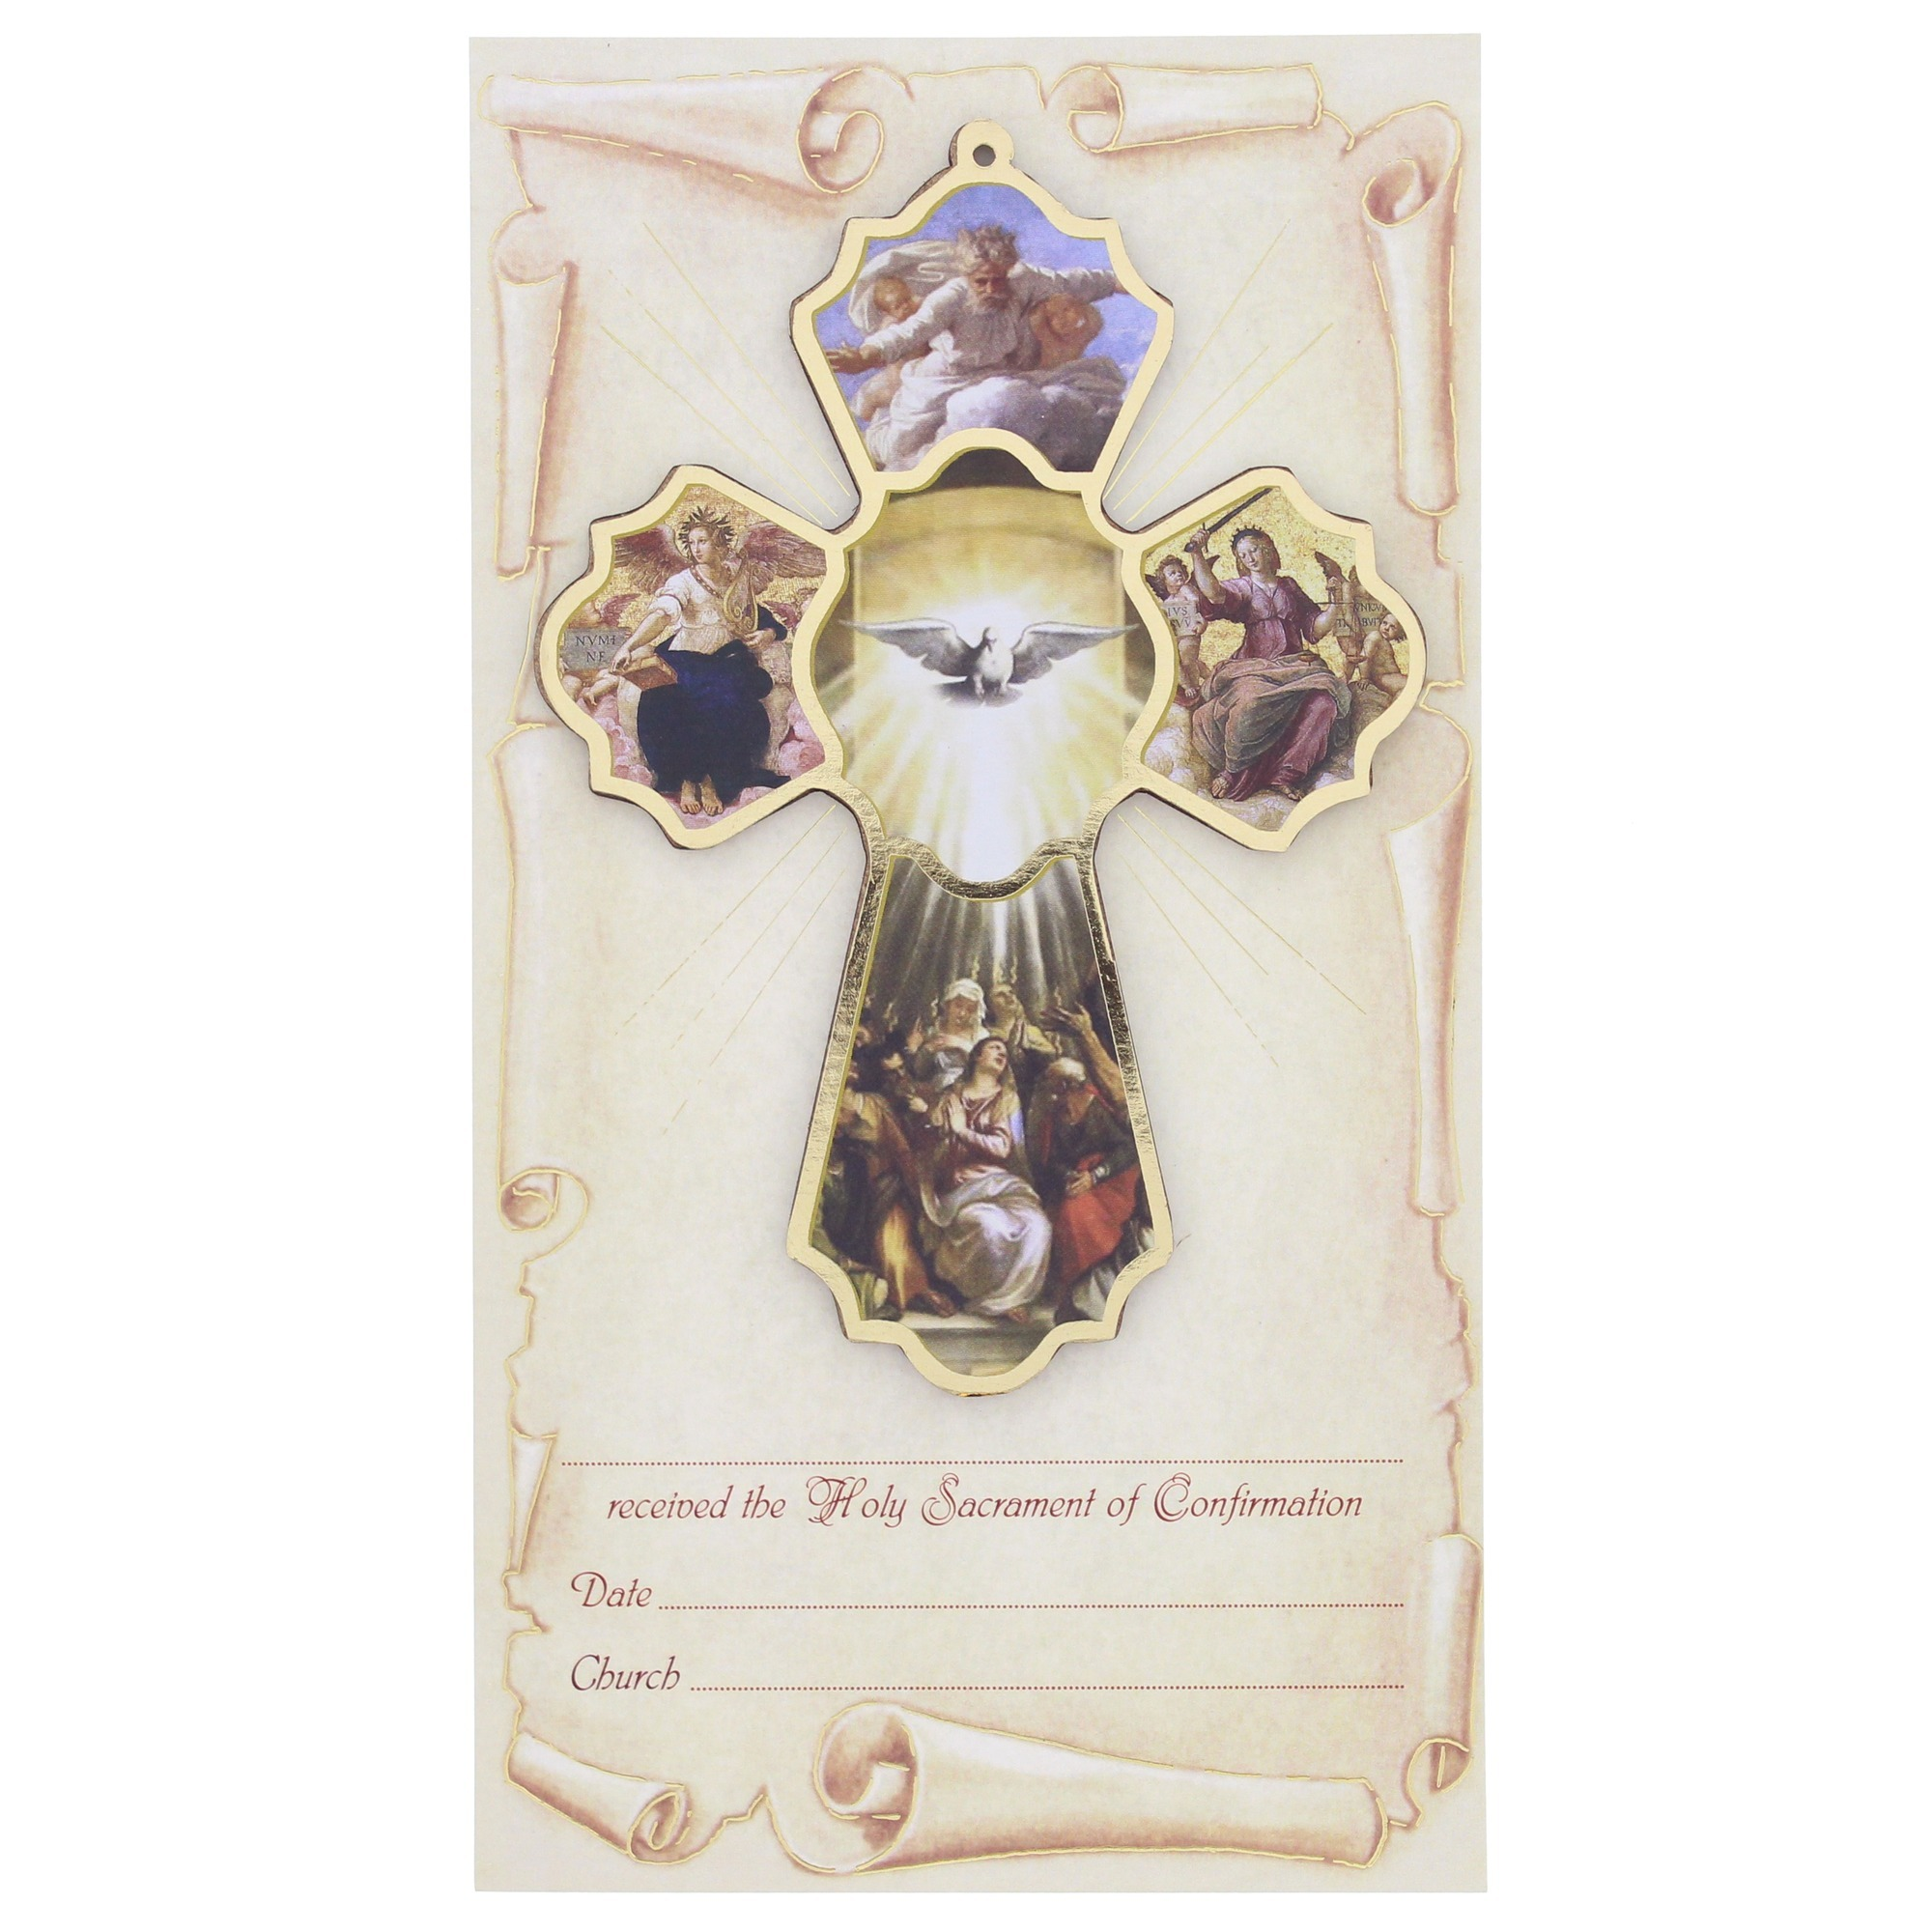 Confirmation Cards The Catholic Company